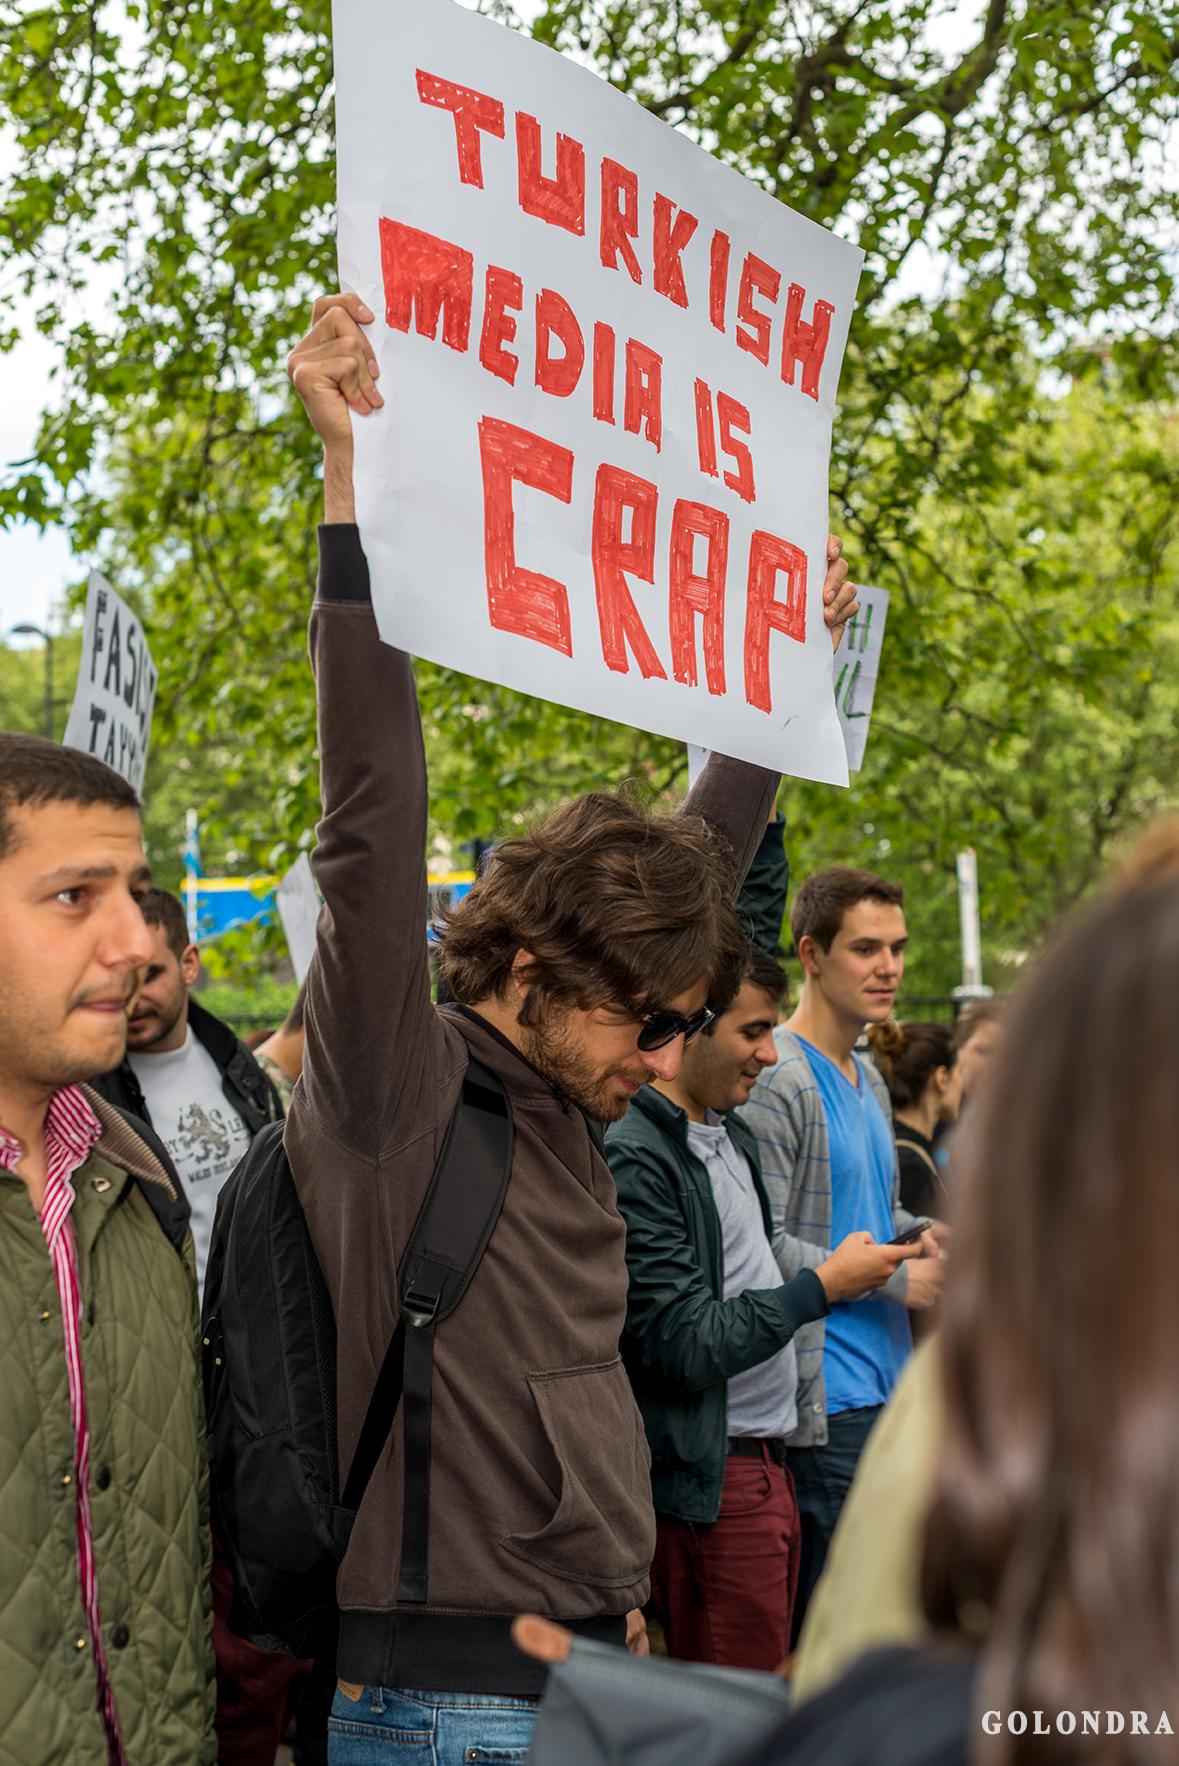 Protesting Turkish Government - Turk Hukumetini Protesto - Londra - London (28)